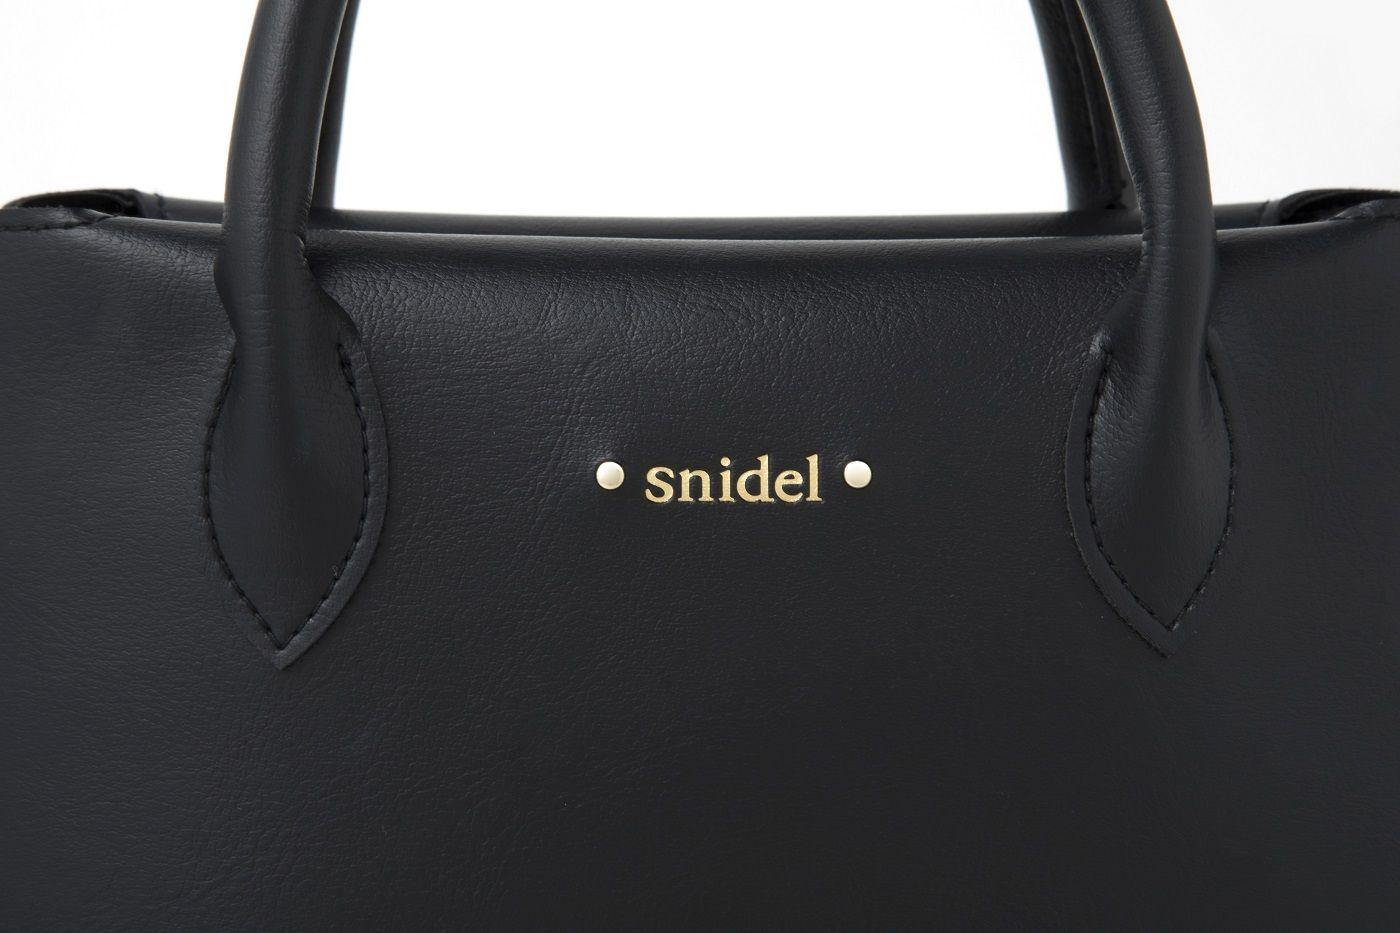 snidel 2017 Autumn/Wint...の紹介画像3